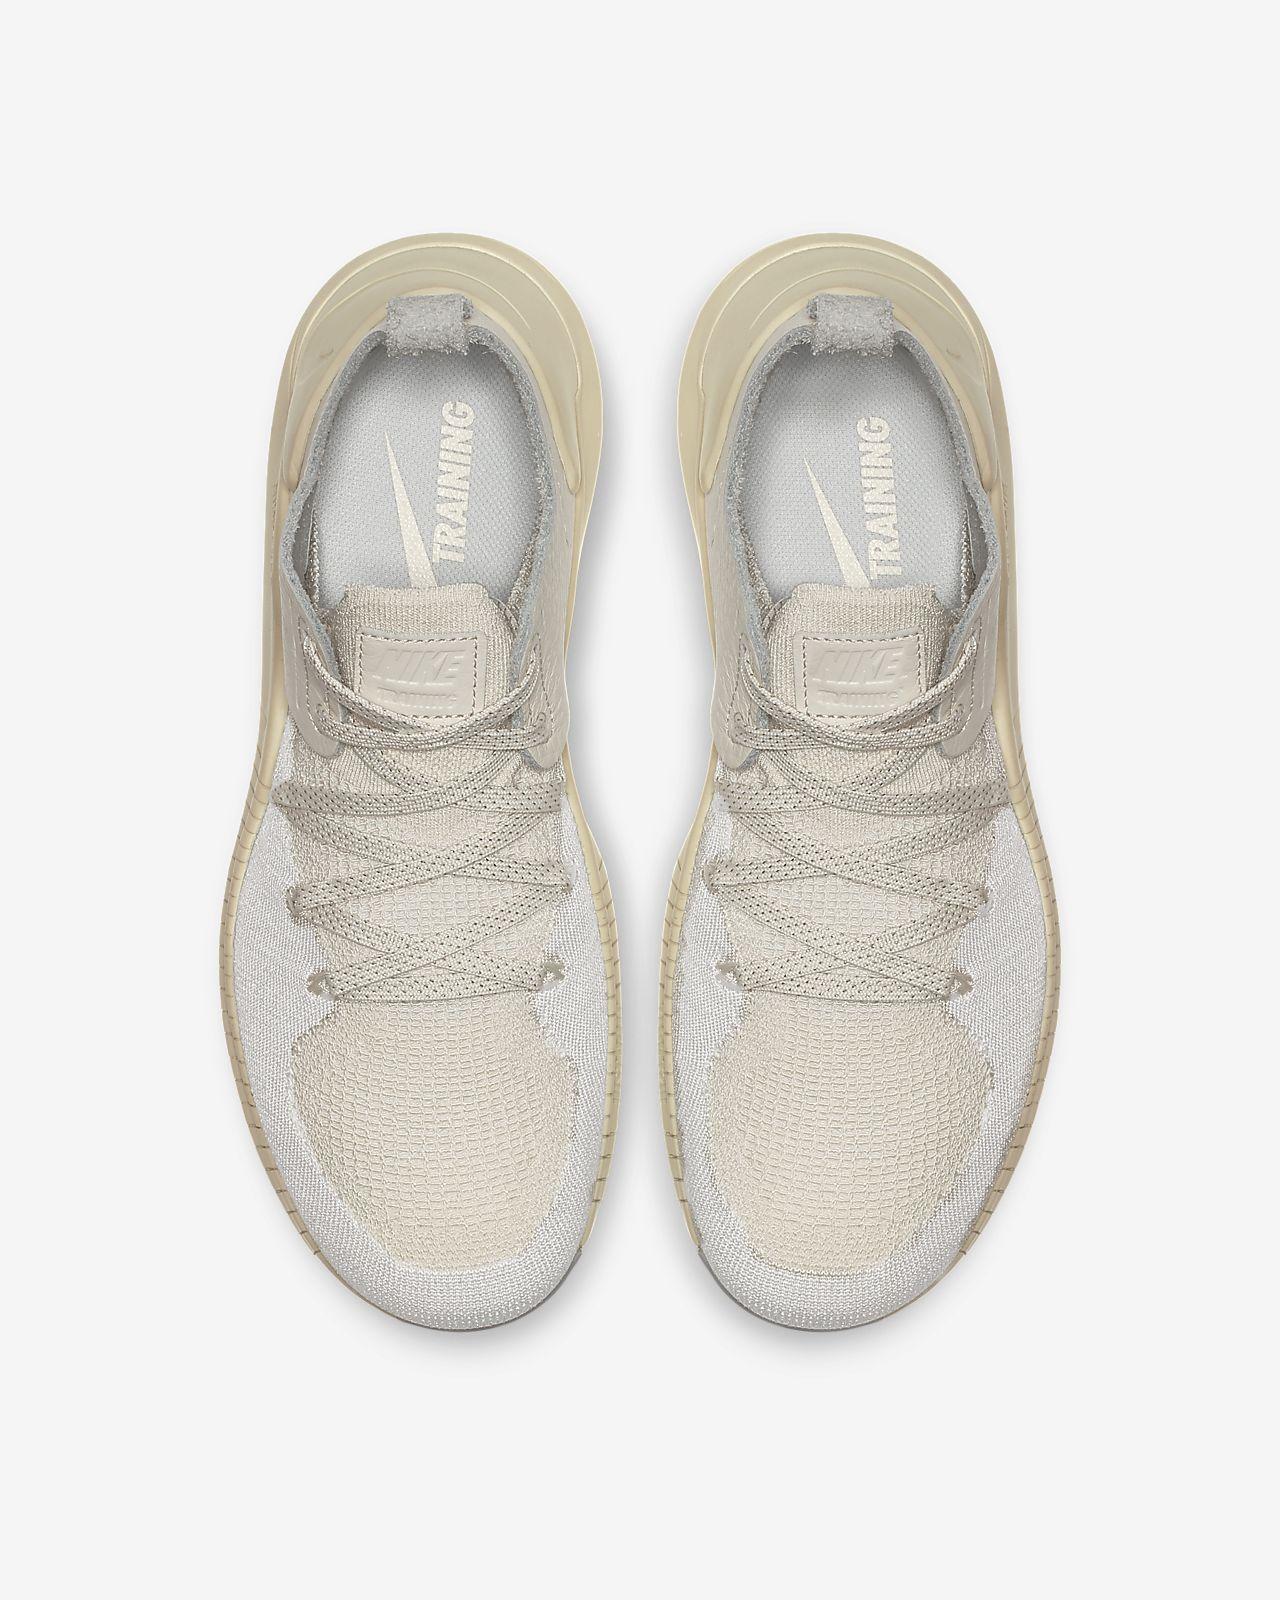 0403fa16d14f1 Nike Free TR Flyknit 3 Champagne Women s Training Shoe. Nike.com NL